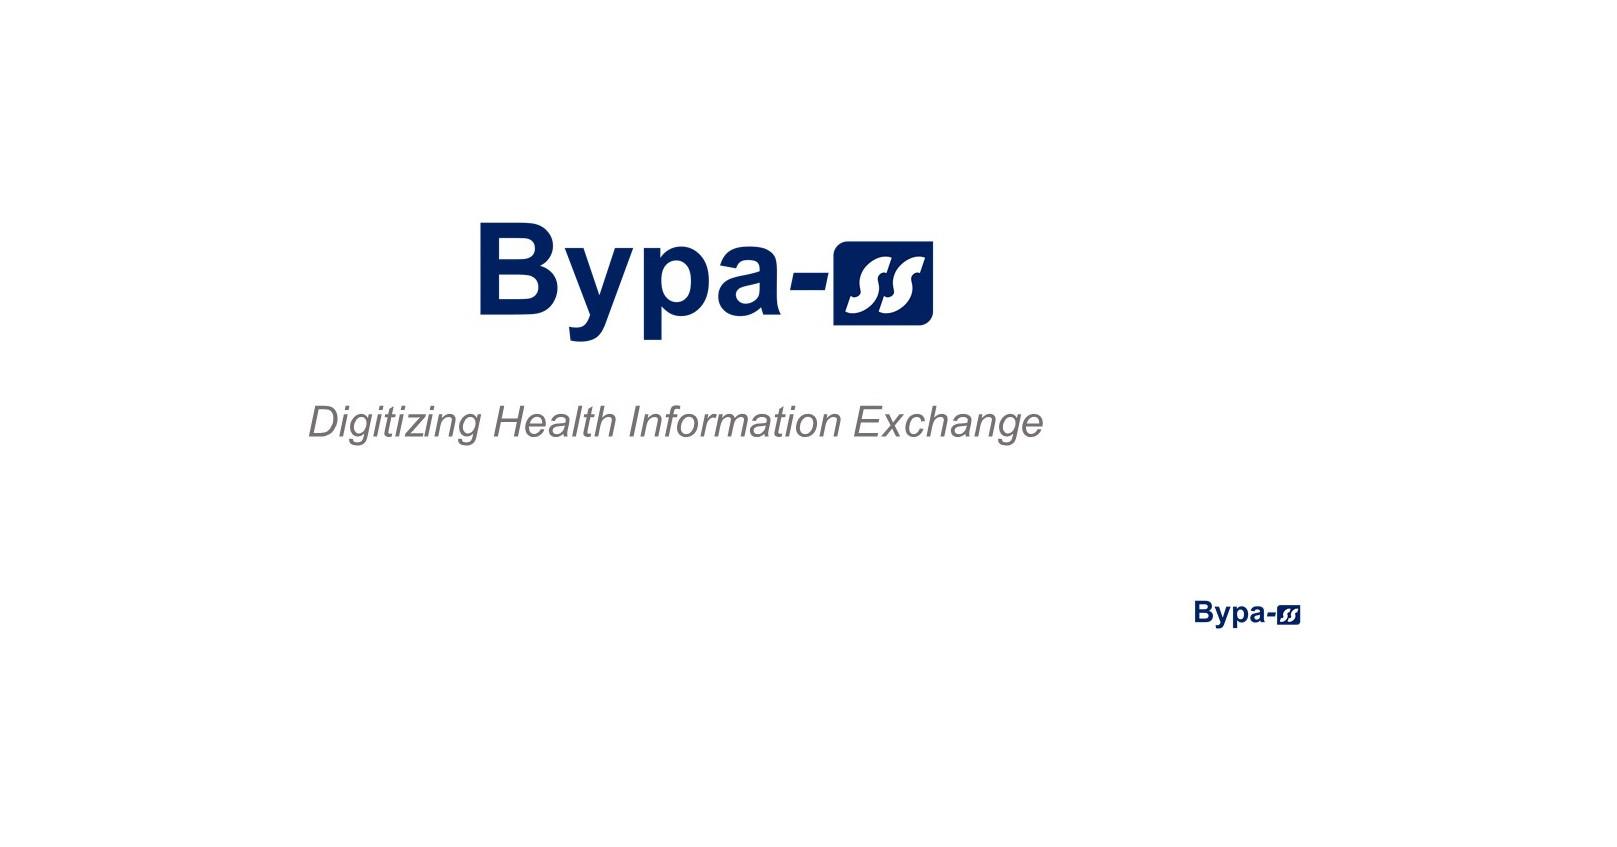 صورة Job: Senior Account Manager at Bypa-ss in Cairo, Egypt